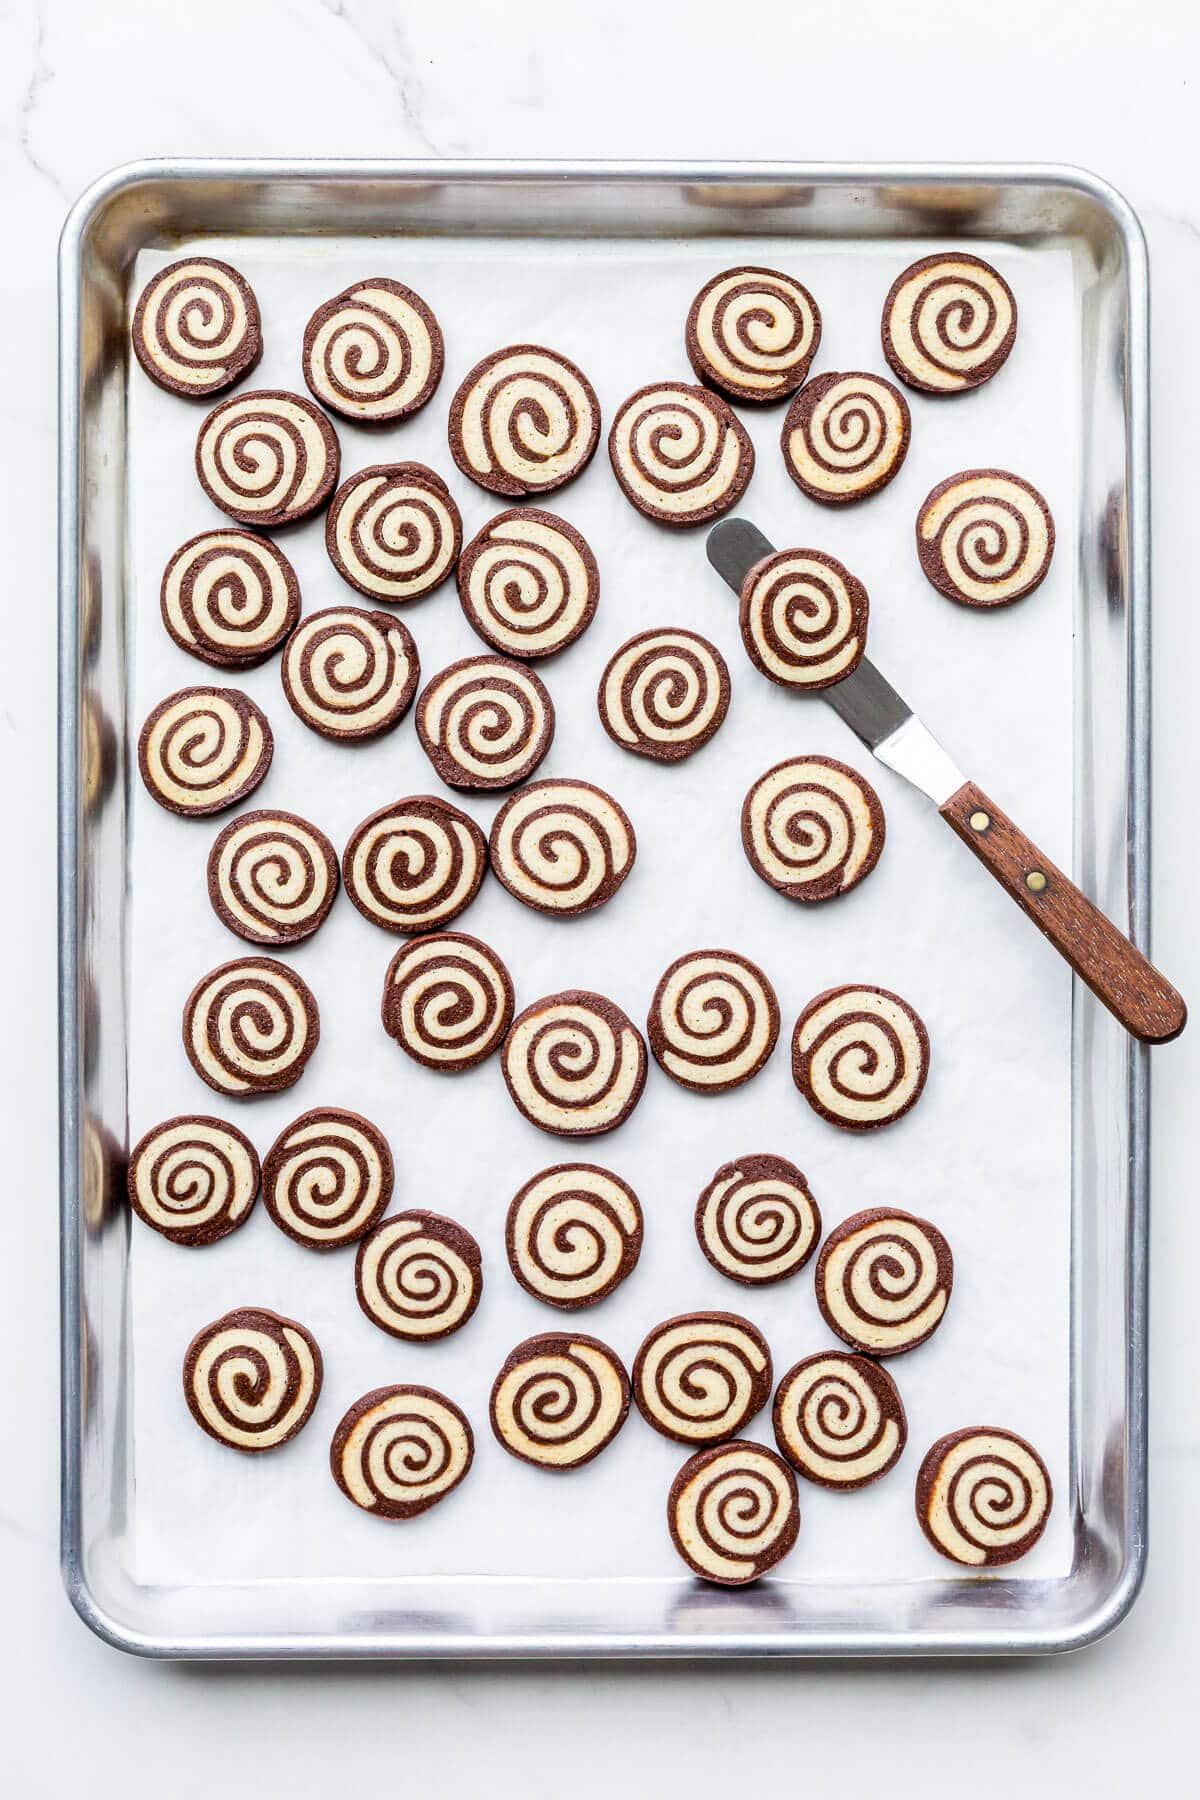 A sheet pan of freshly baked chocolate and vanilla pinwheel cookies.